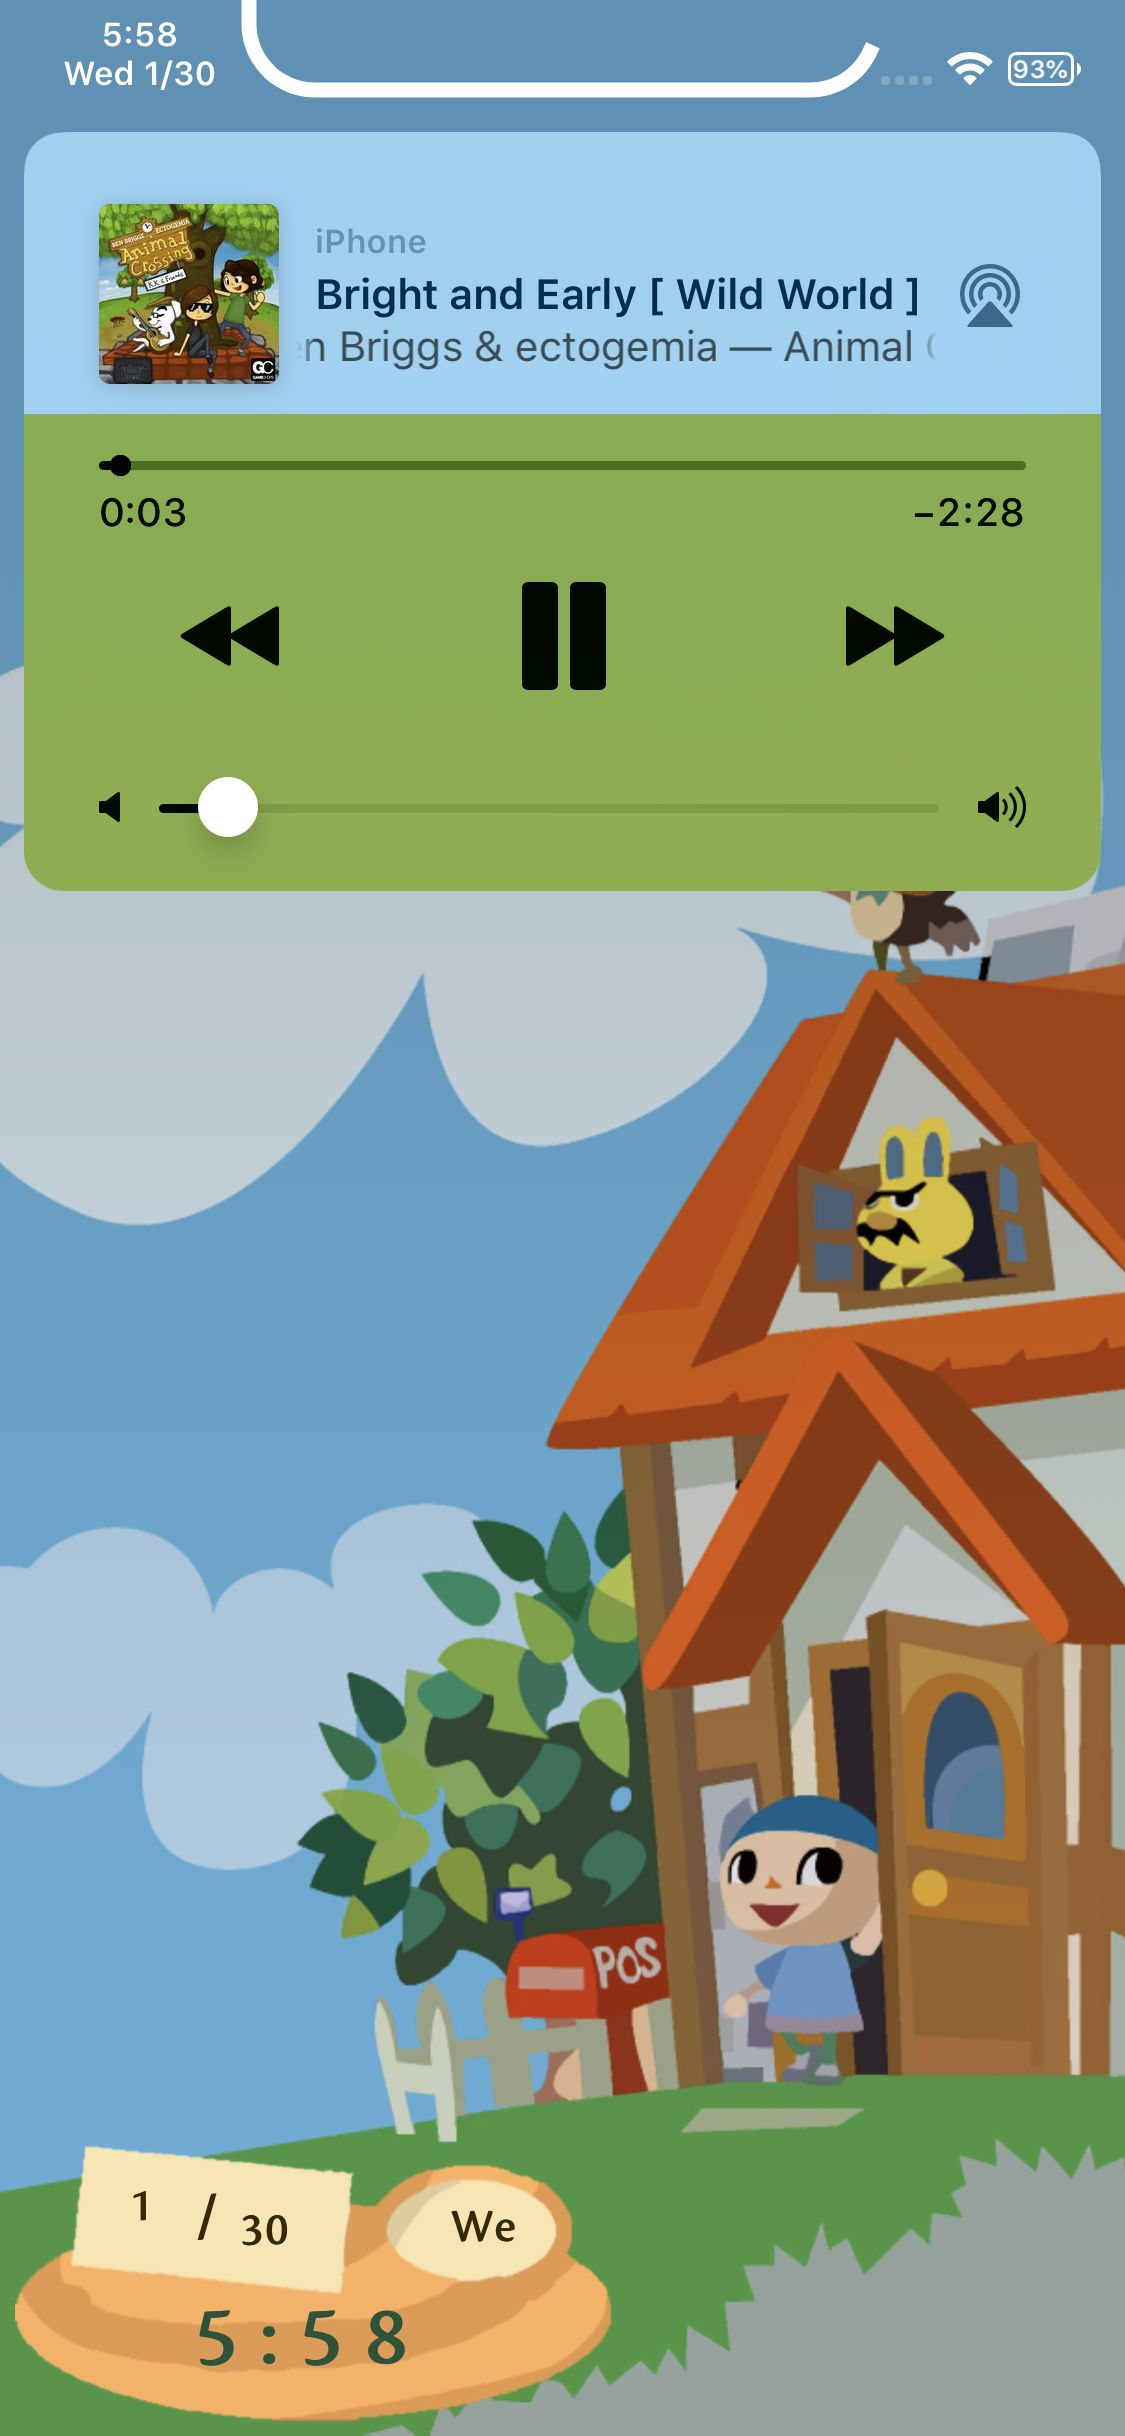 Animal Crossing Iphone Animal Crossing Iphone Animal Crossing Wallpaper Animal Crossing Iphone Wallpaper